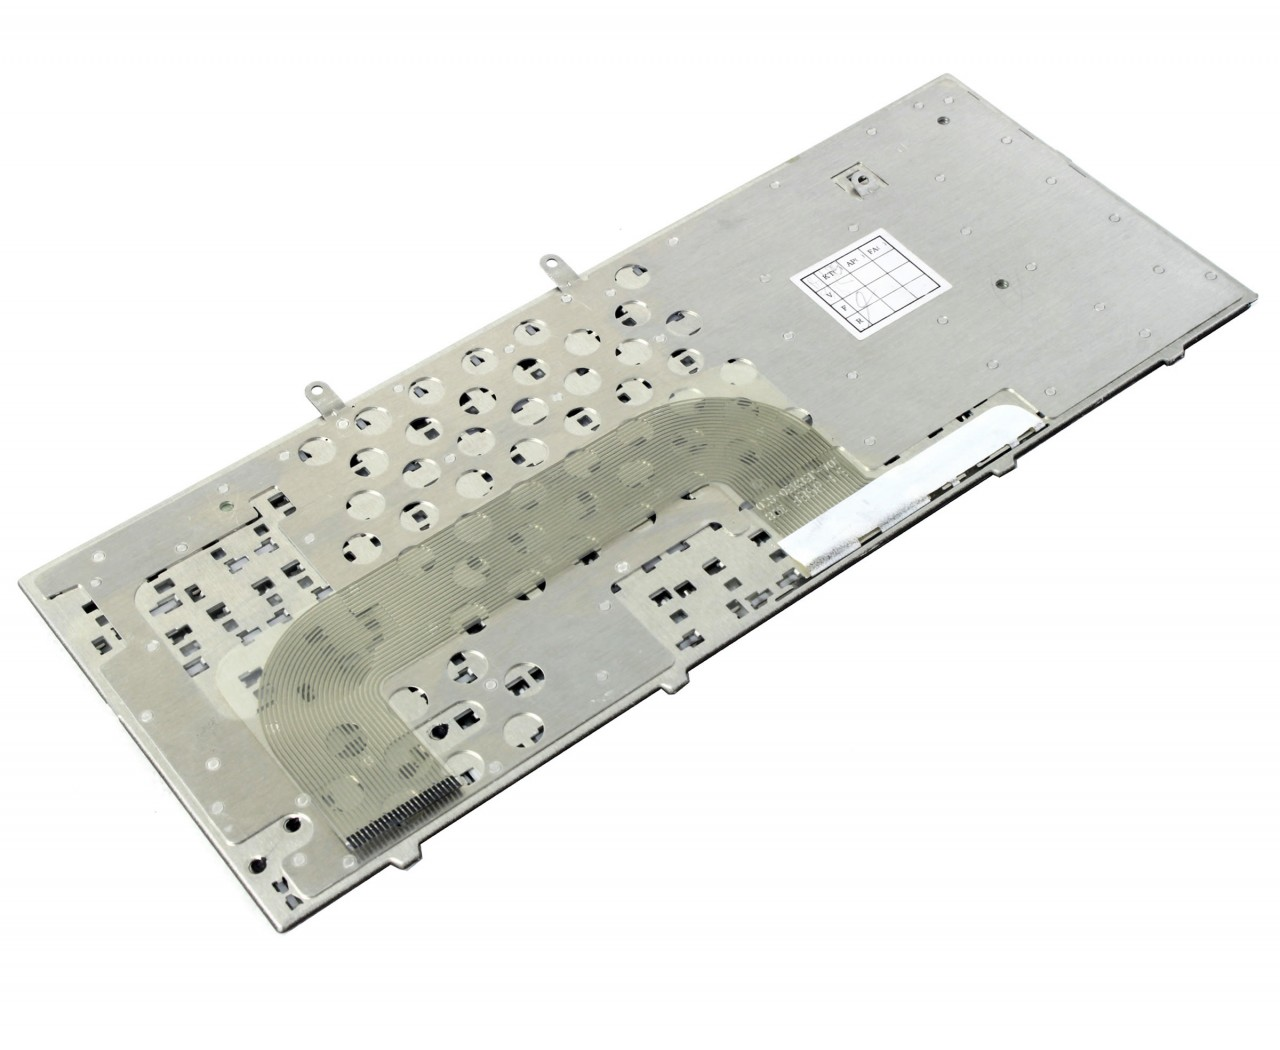 Tastatura HP Mini 110 1170 imagine powerlaptop.ro 2021